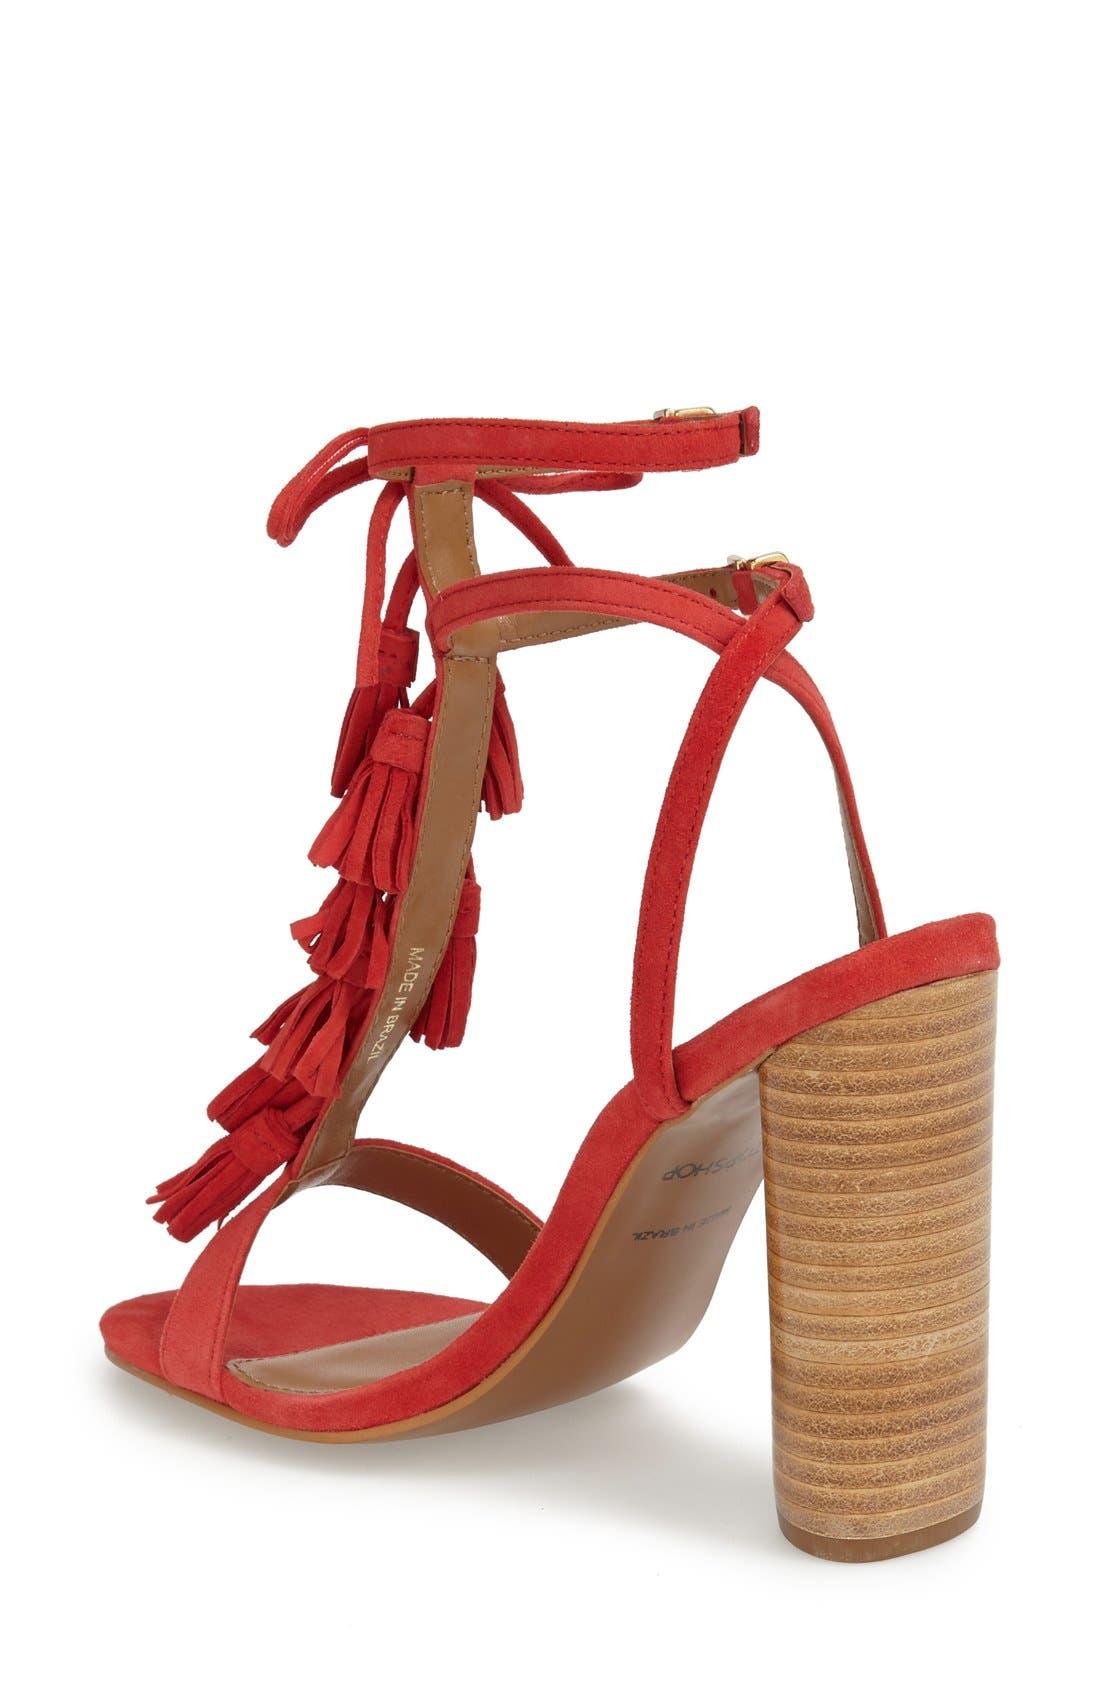 Alternate Image 2  - Topshop 'Ripple' Tasseled Round Heel Sandal (Women)